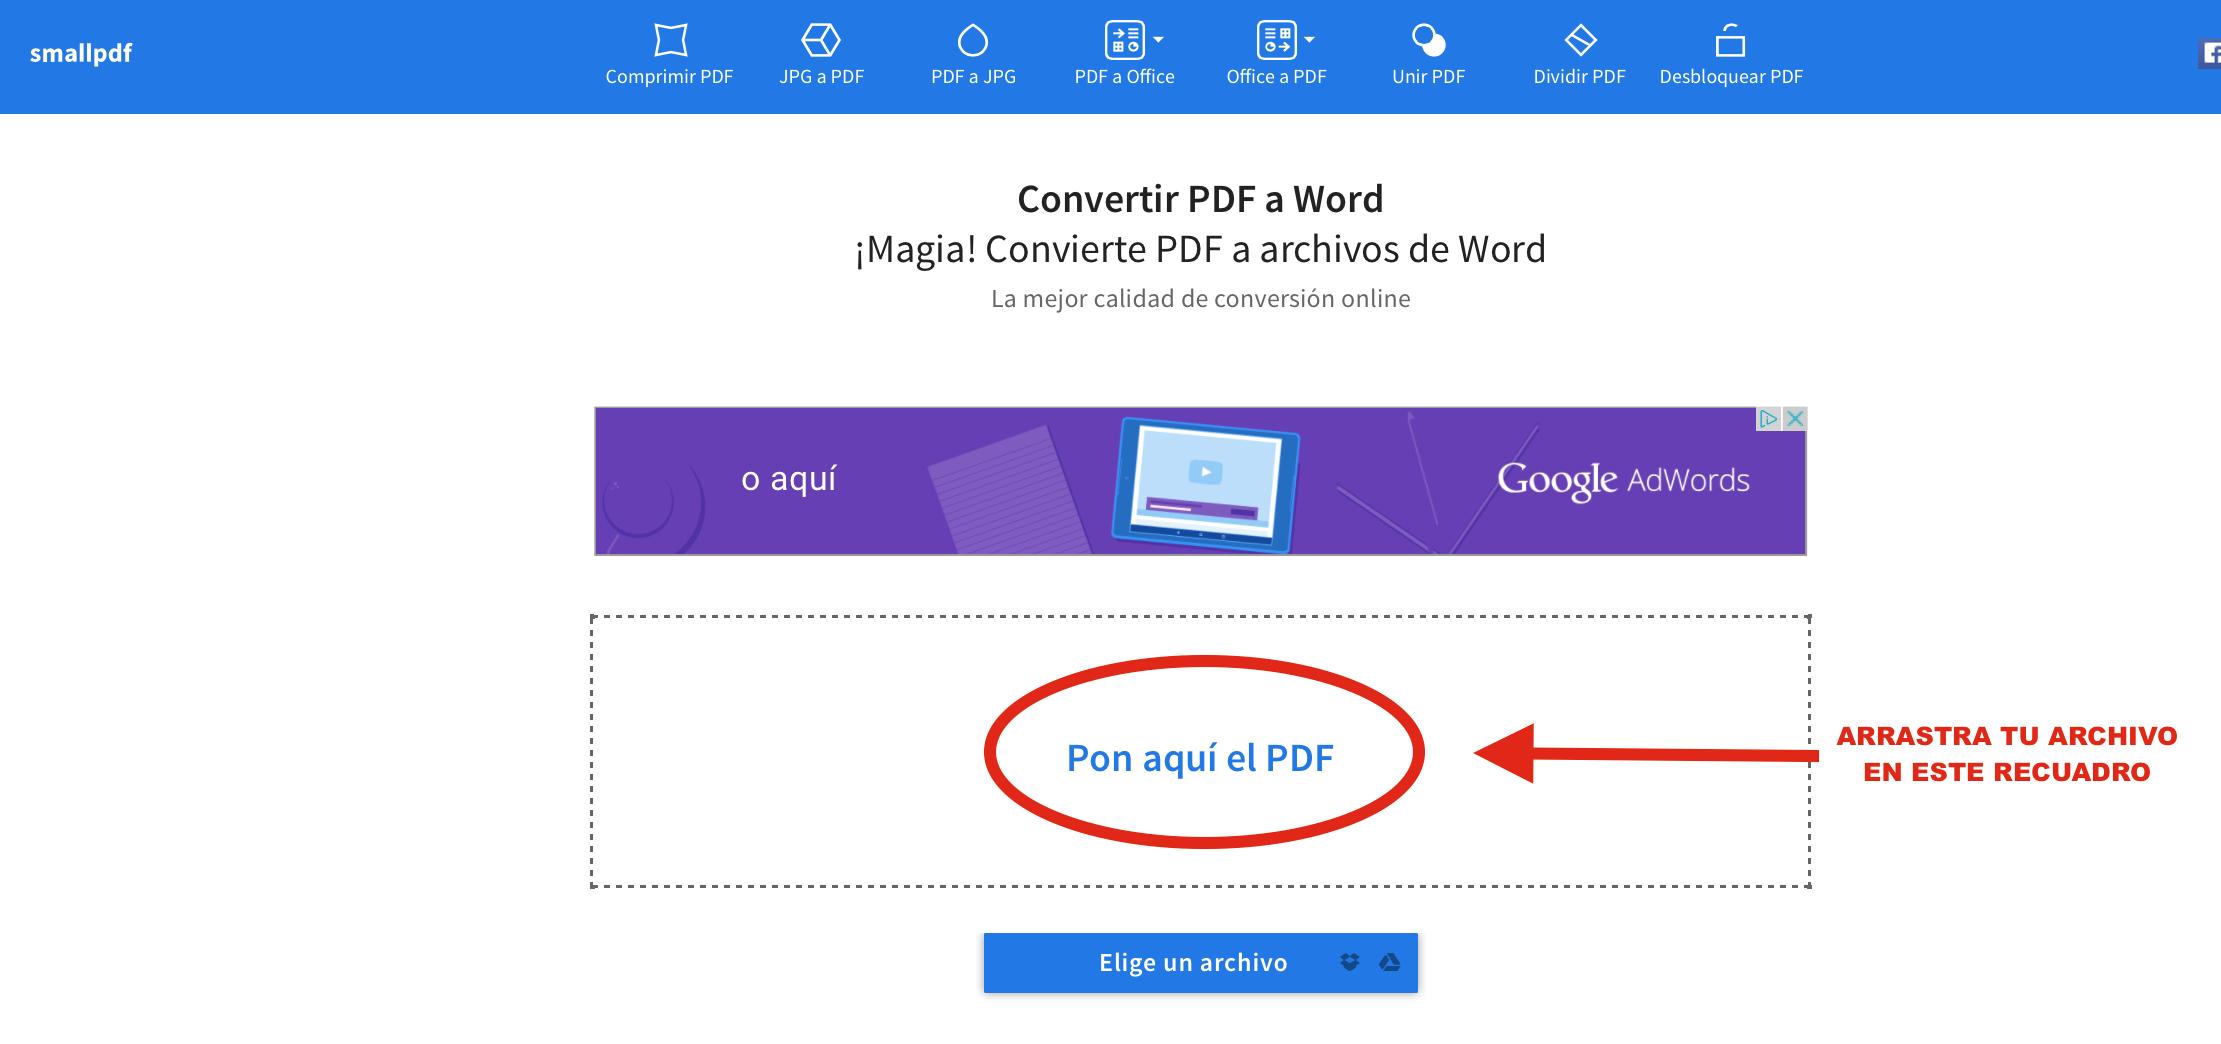 como convertir pdf a word gratis y en segundos   diario de